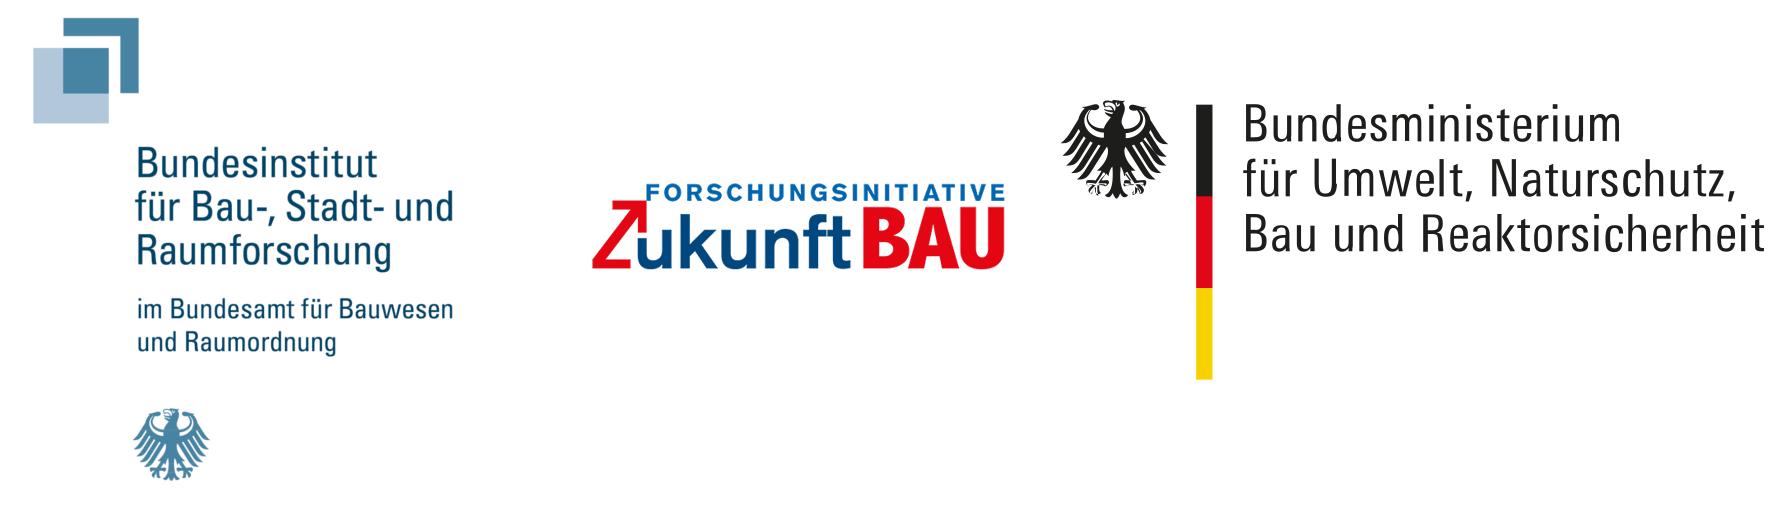 image sources: www.bmub.bund.de, www.forschungsinitiative.de, www.bbsr.bund.de